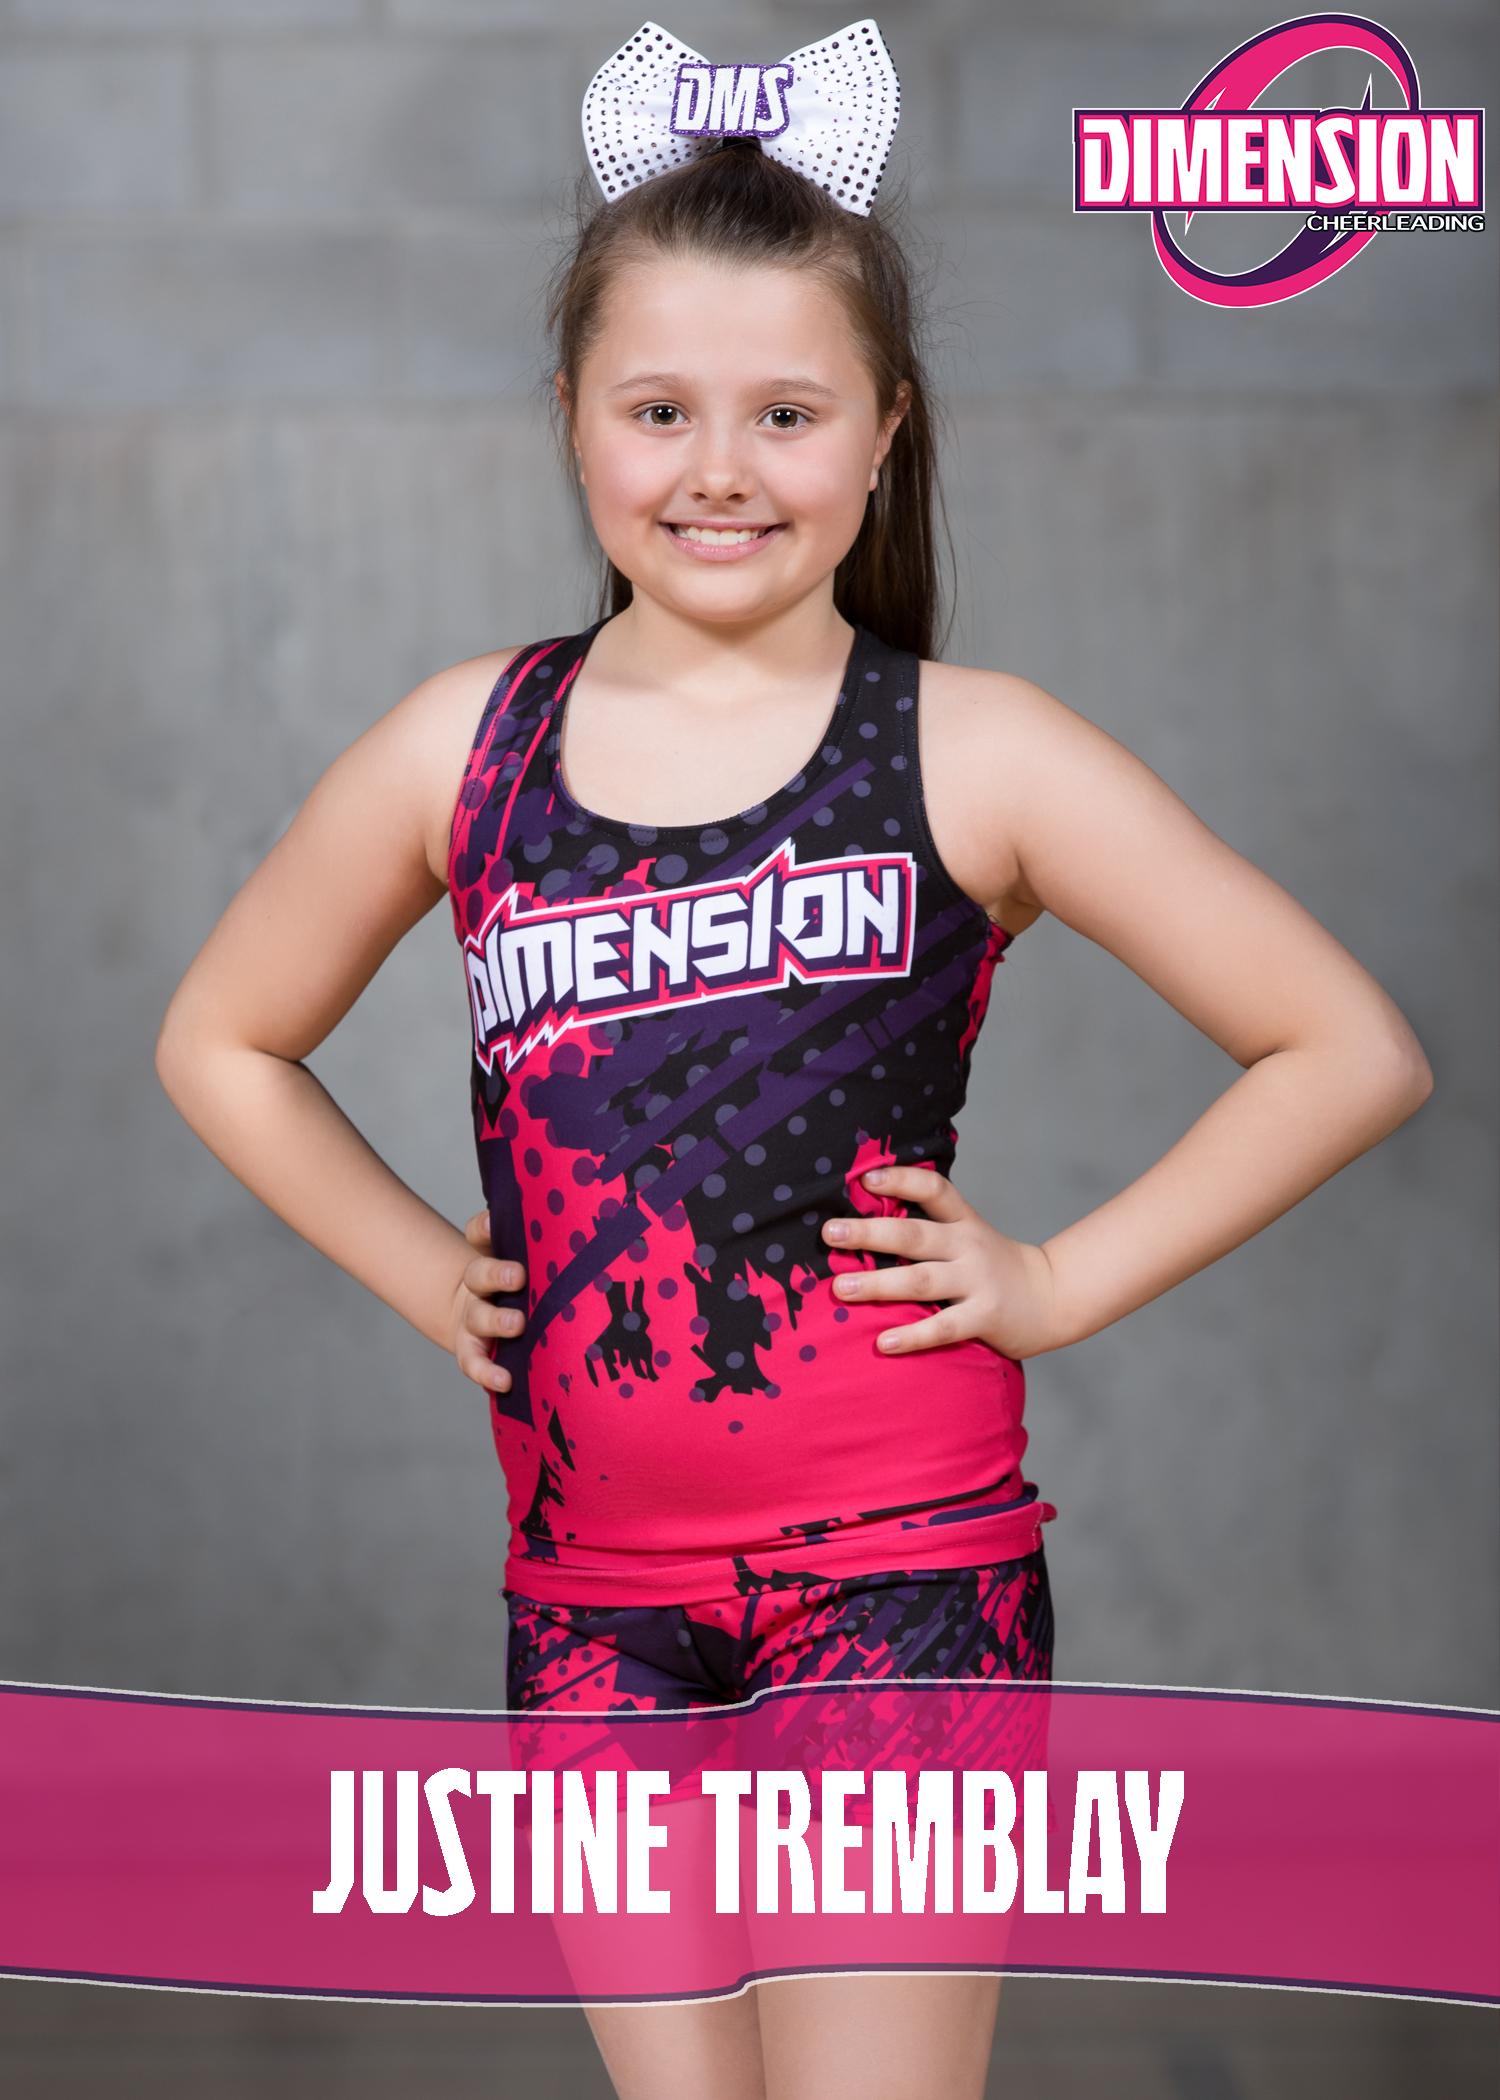 Justine Tremblay